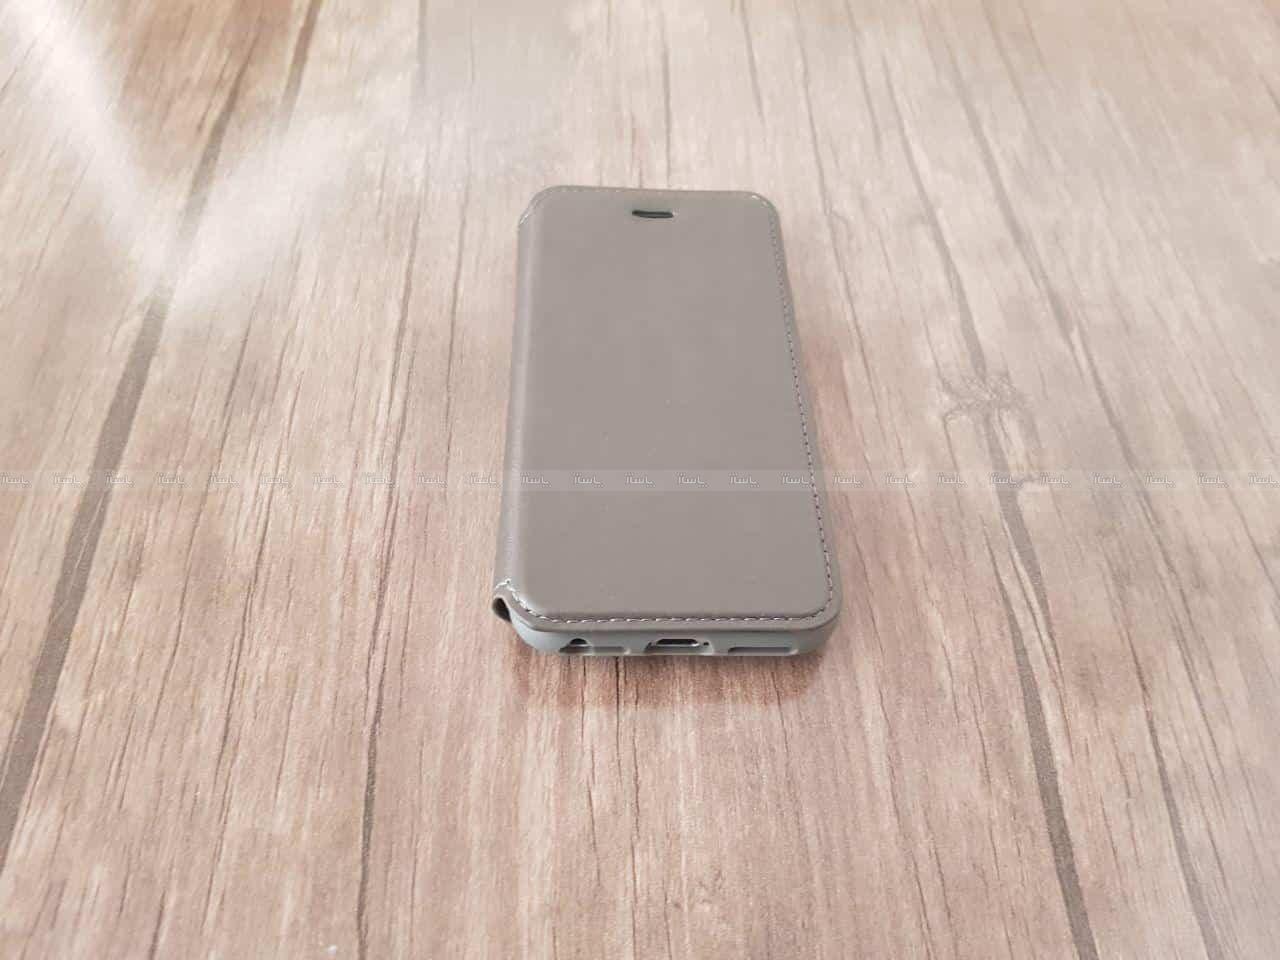 کیس چرمی سه کاره برند ویوو ایفون wiwu case magic 3in1 iphone 6/6s-تصویر اصلی